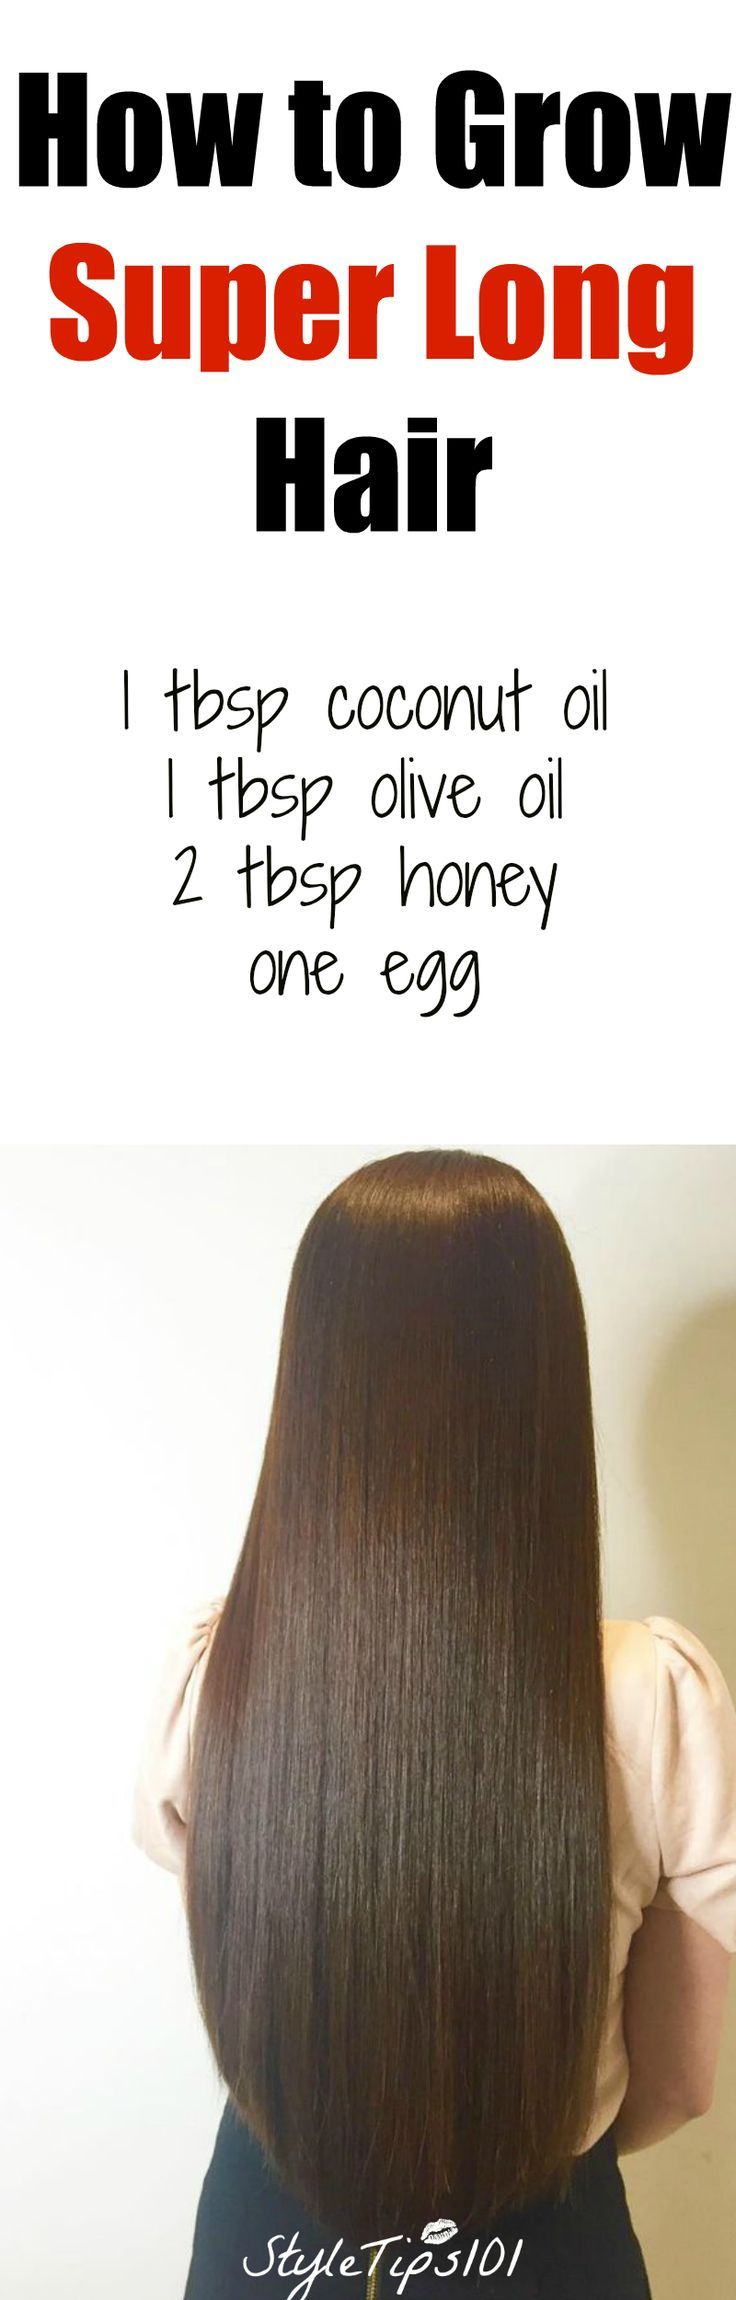 How to Grow Super Long Hair You'll Need: 1 tbsp coconut oil 1 tbsp olive oil 2...